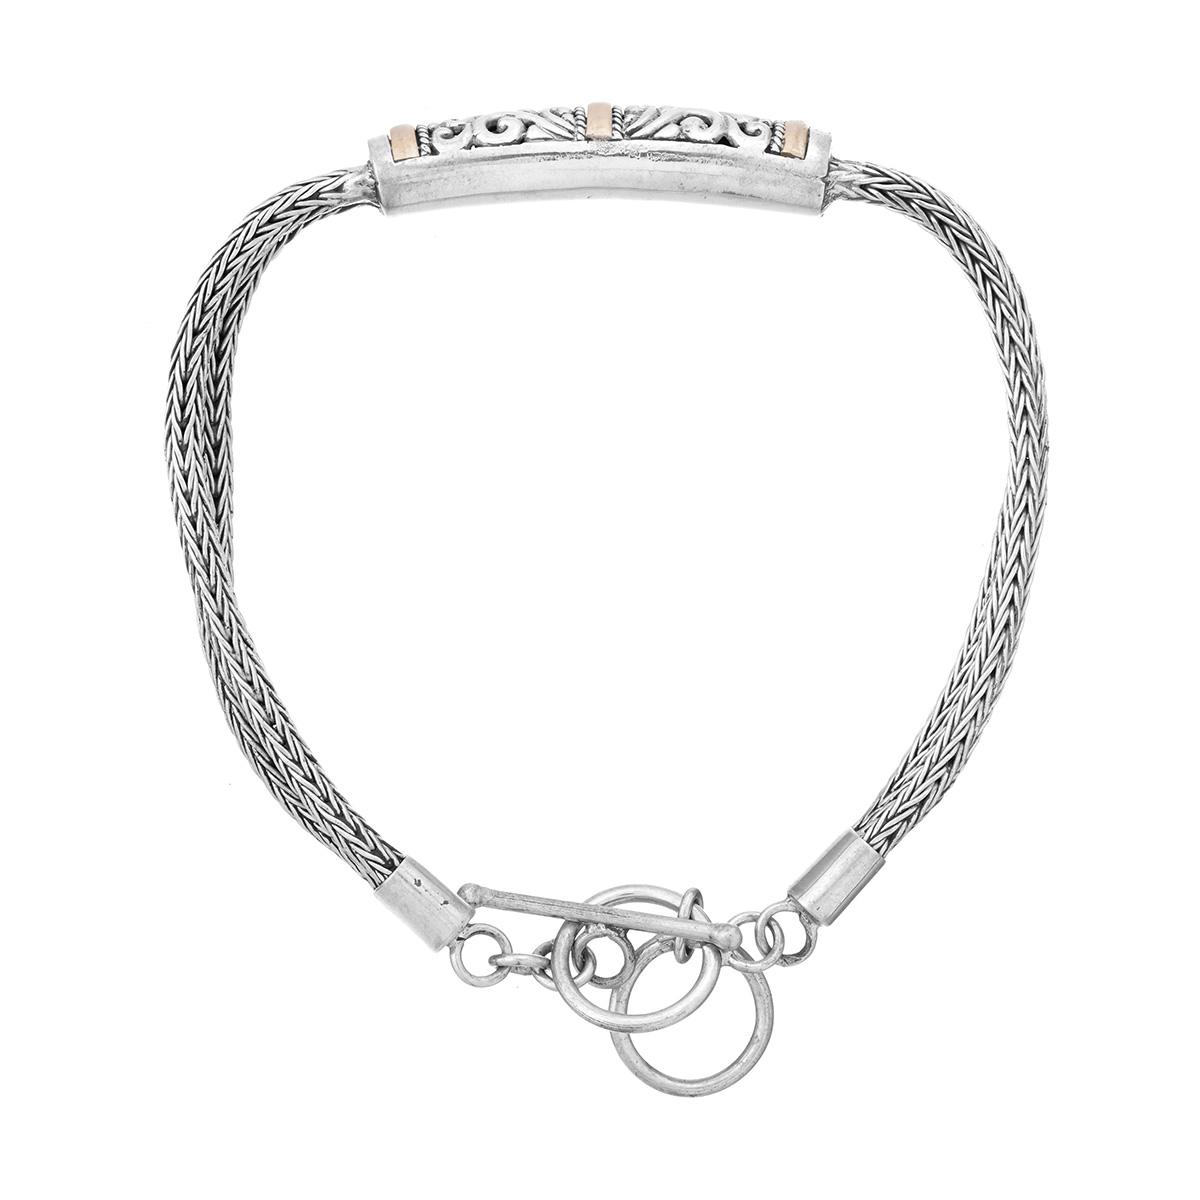 Tanjun Silver Bracelet